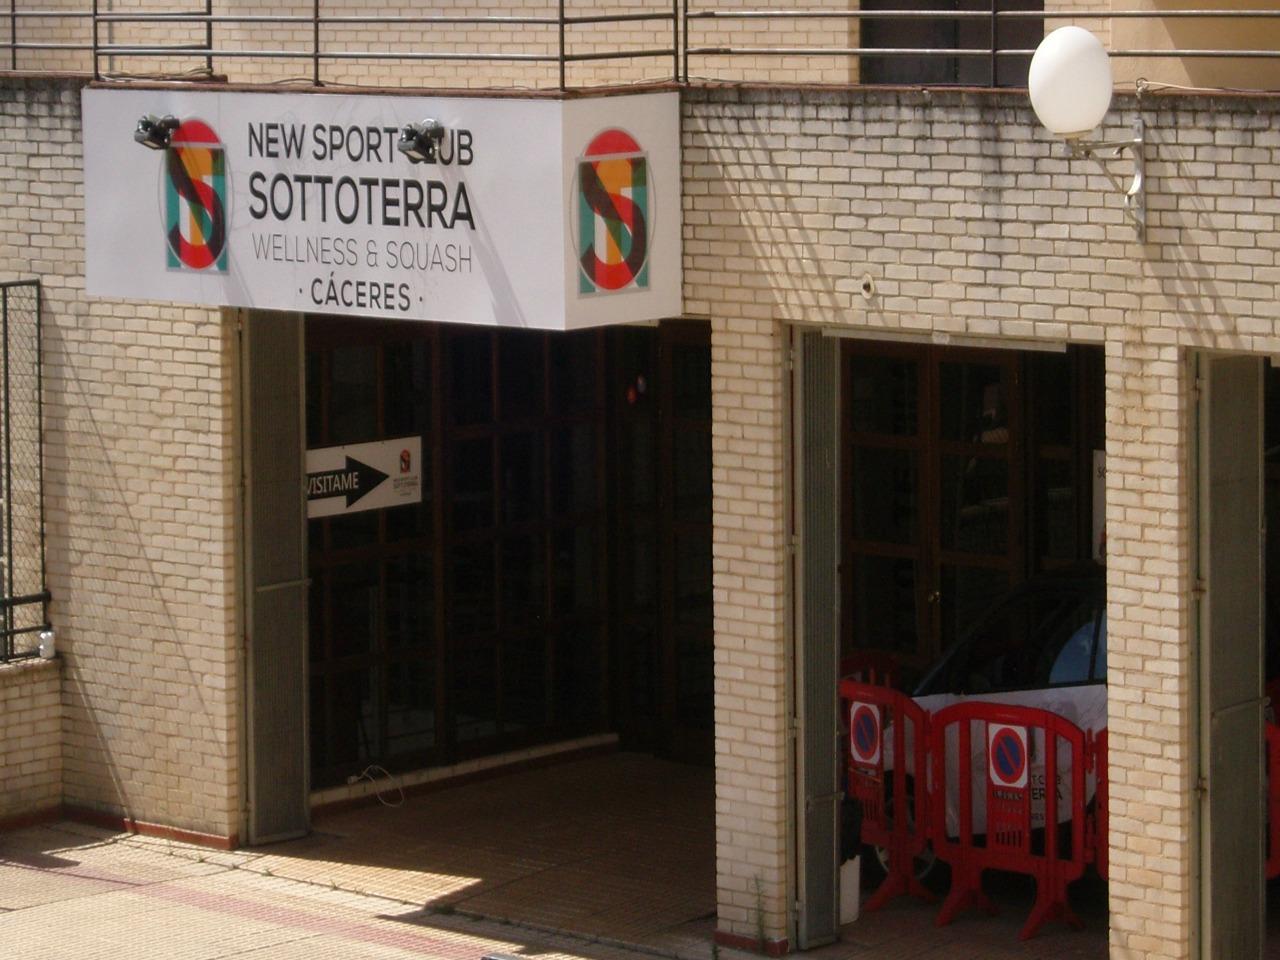 NEW SPORT CLUB SOTTOTERRA, Gimnasio económico en Cáceres,Pilates en Cáceres,Acondicionamiento Físico,Zumba,ABS,Step,Body Combat,Body Jump,Cardio Tonic